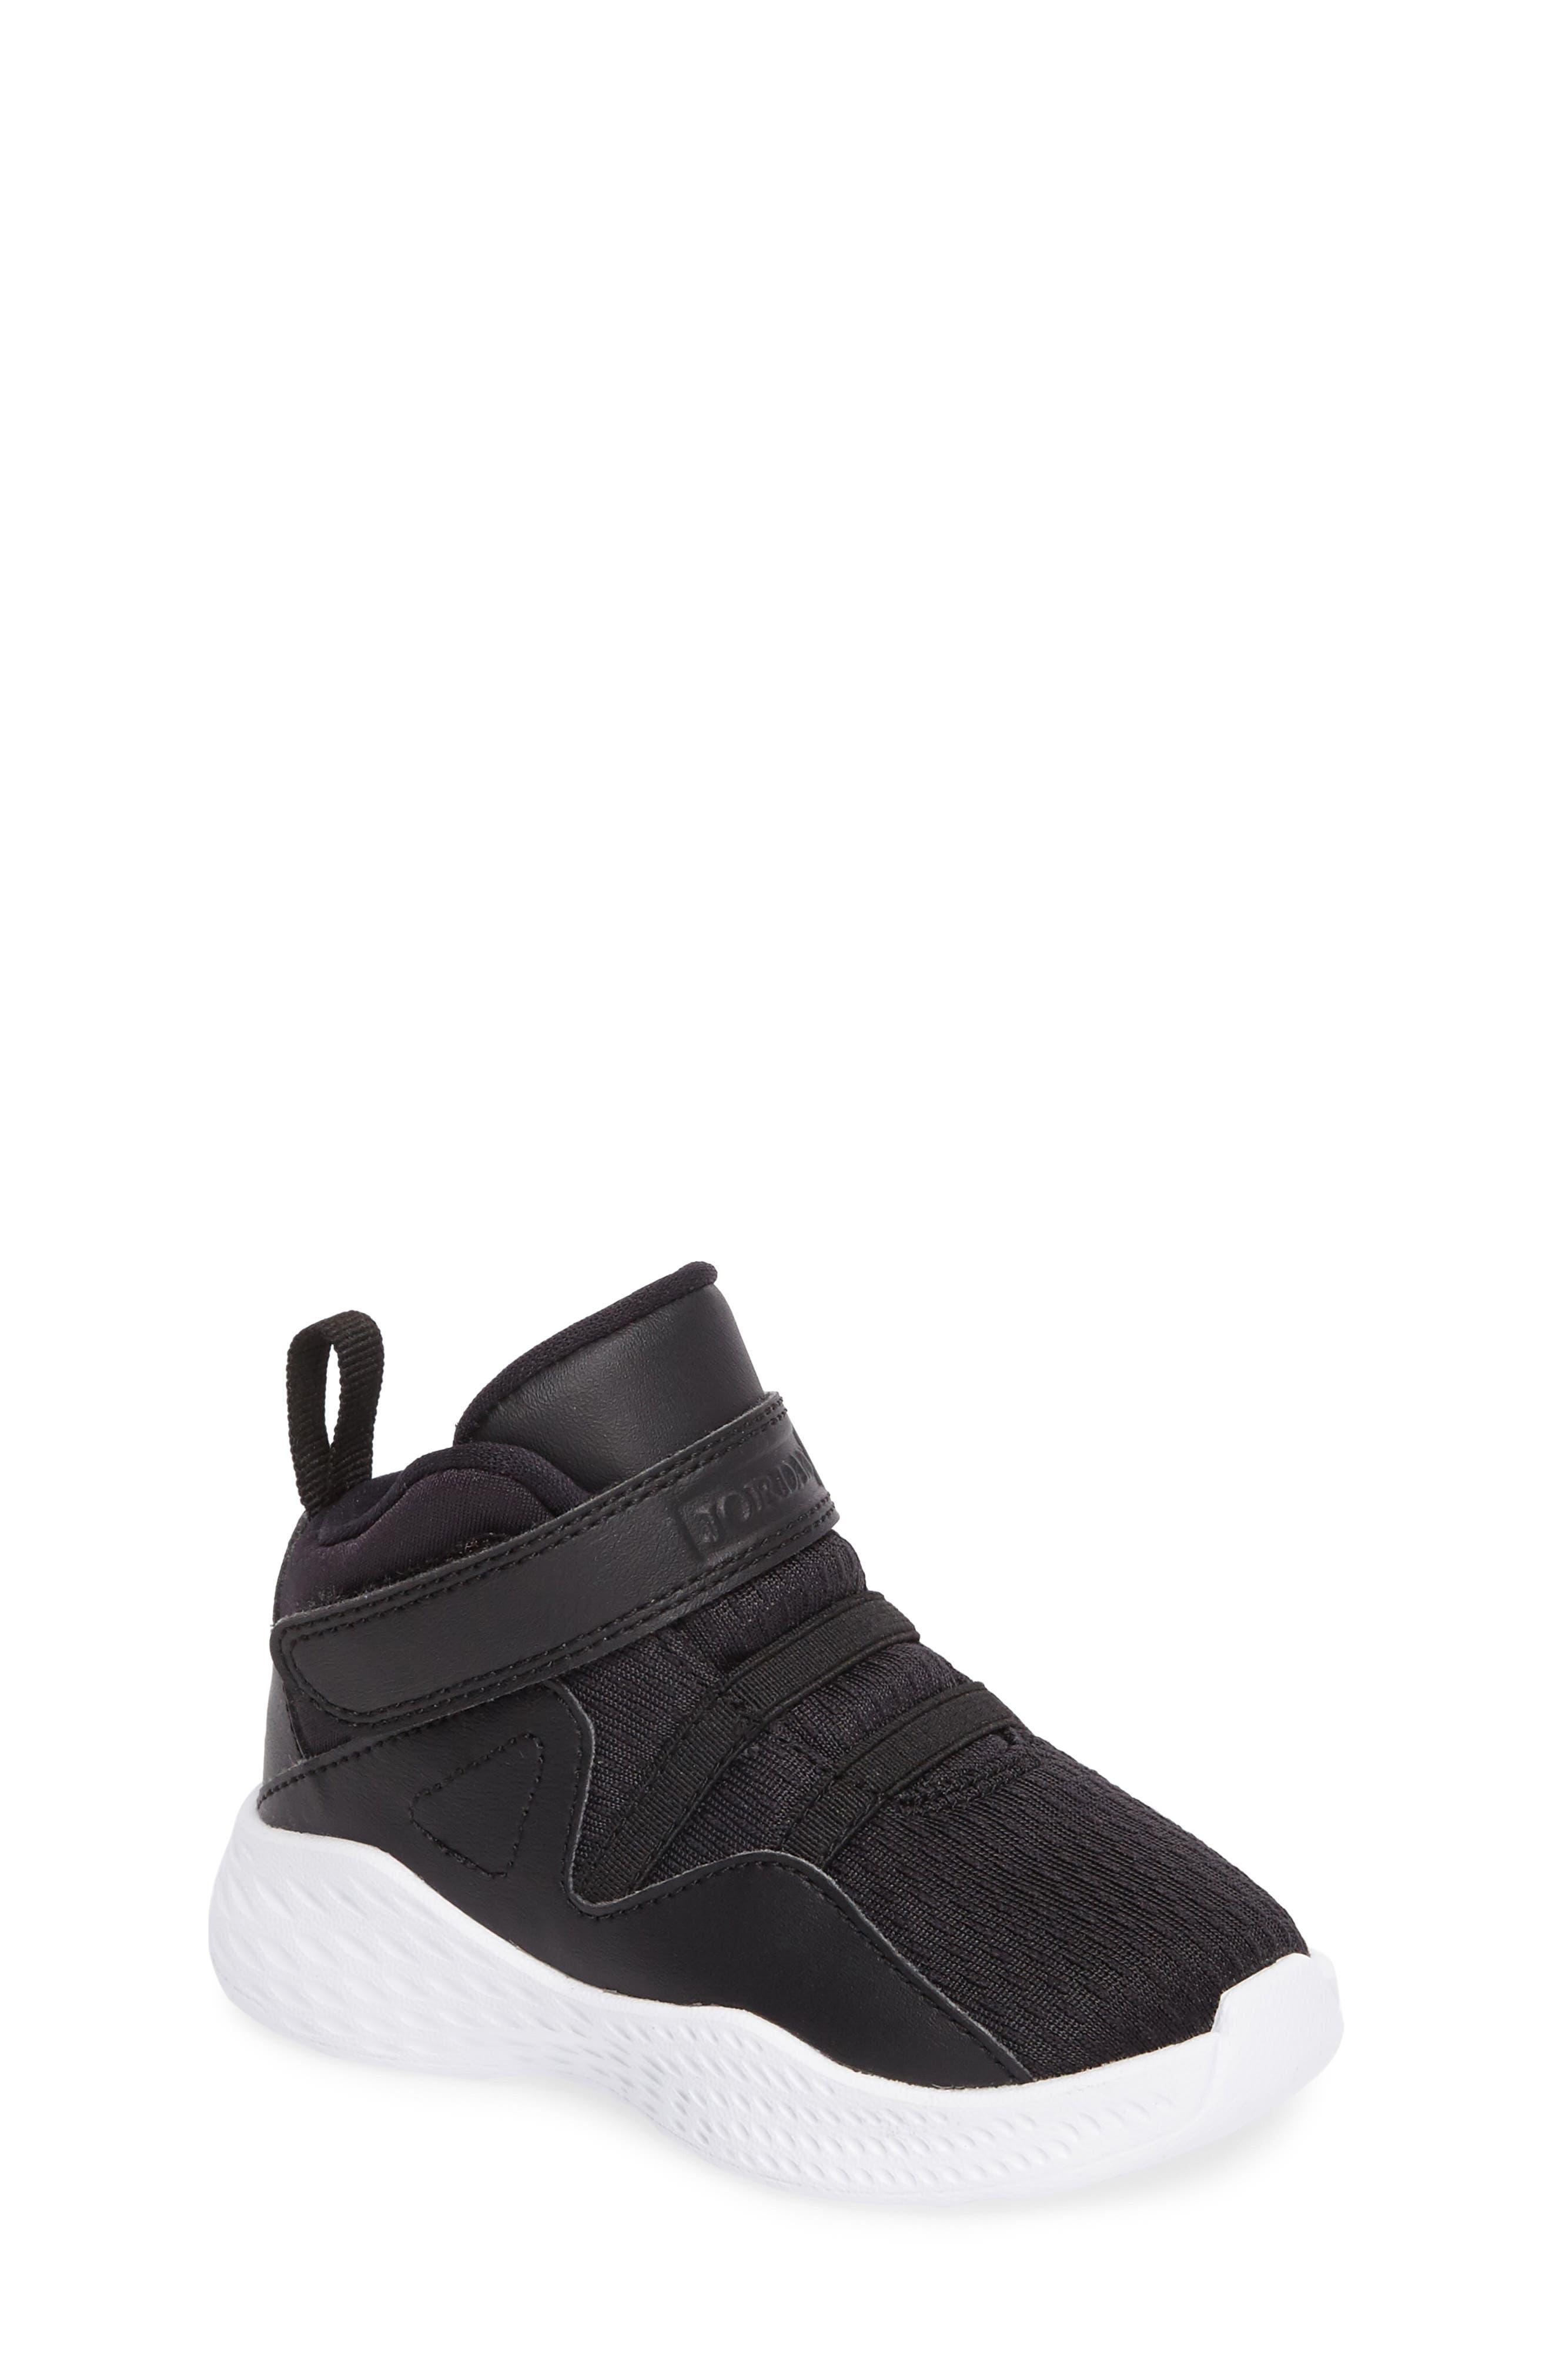 Jordan Formula 23 Basketball Shoe,                         Main,                         color,